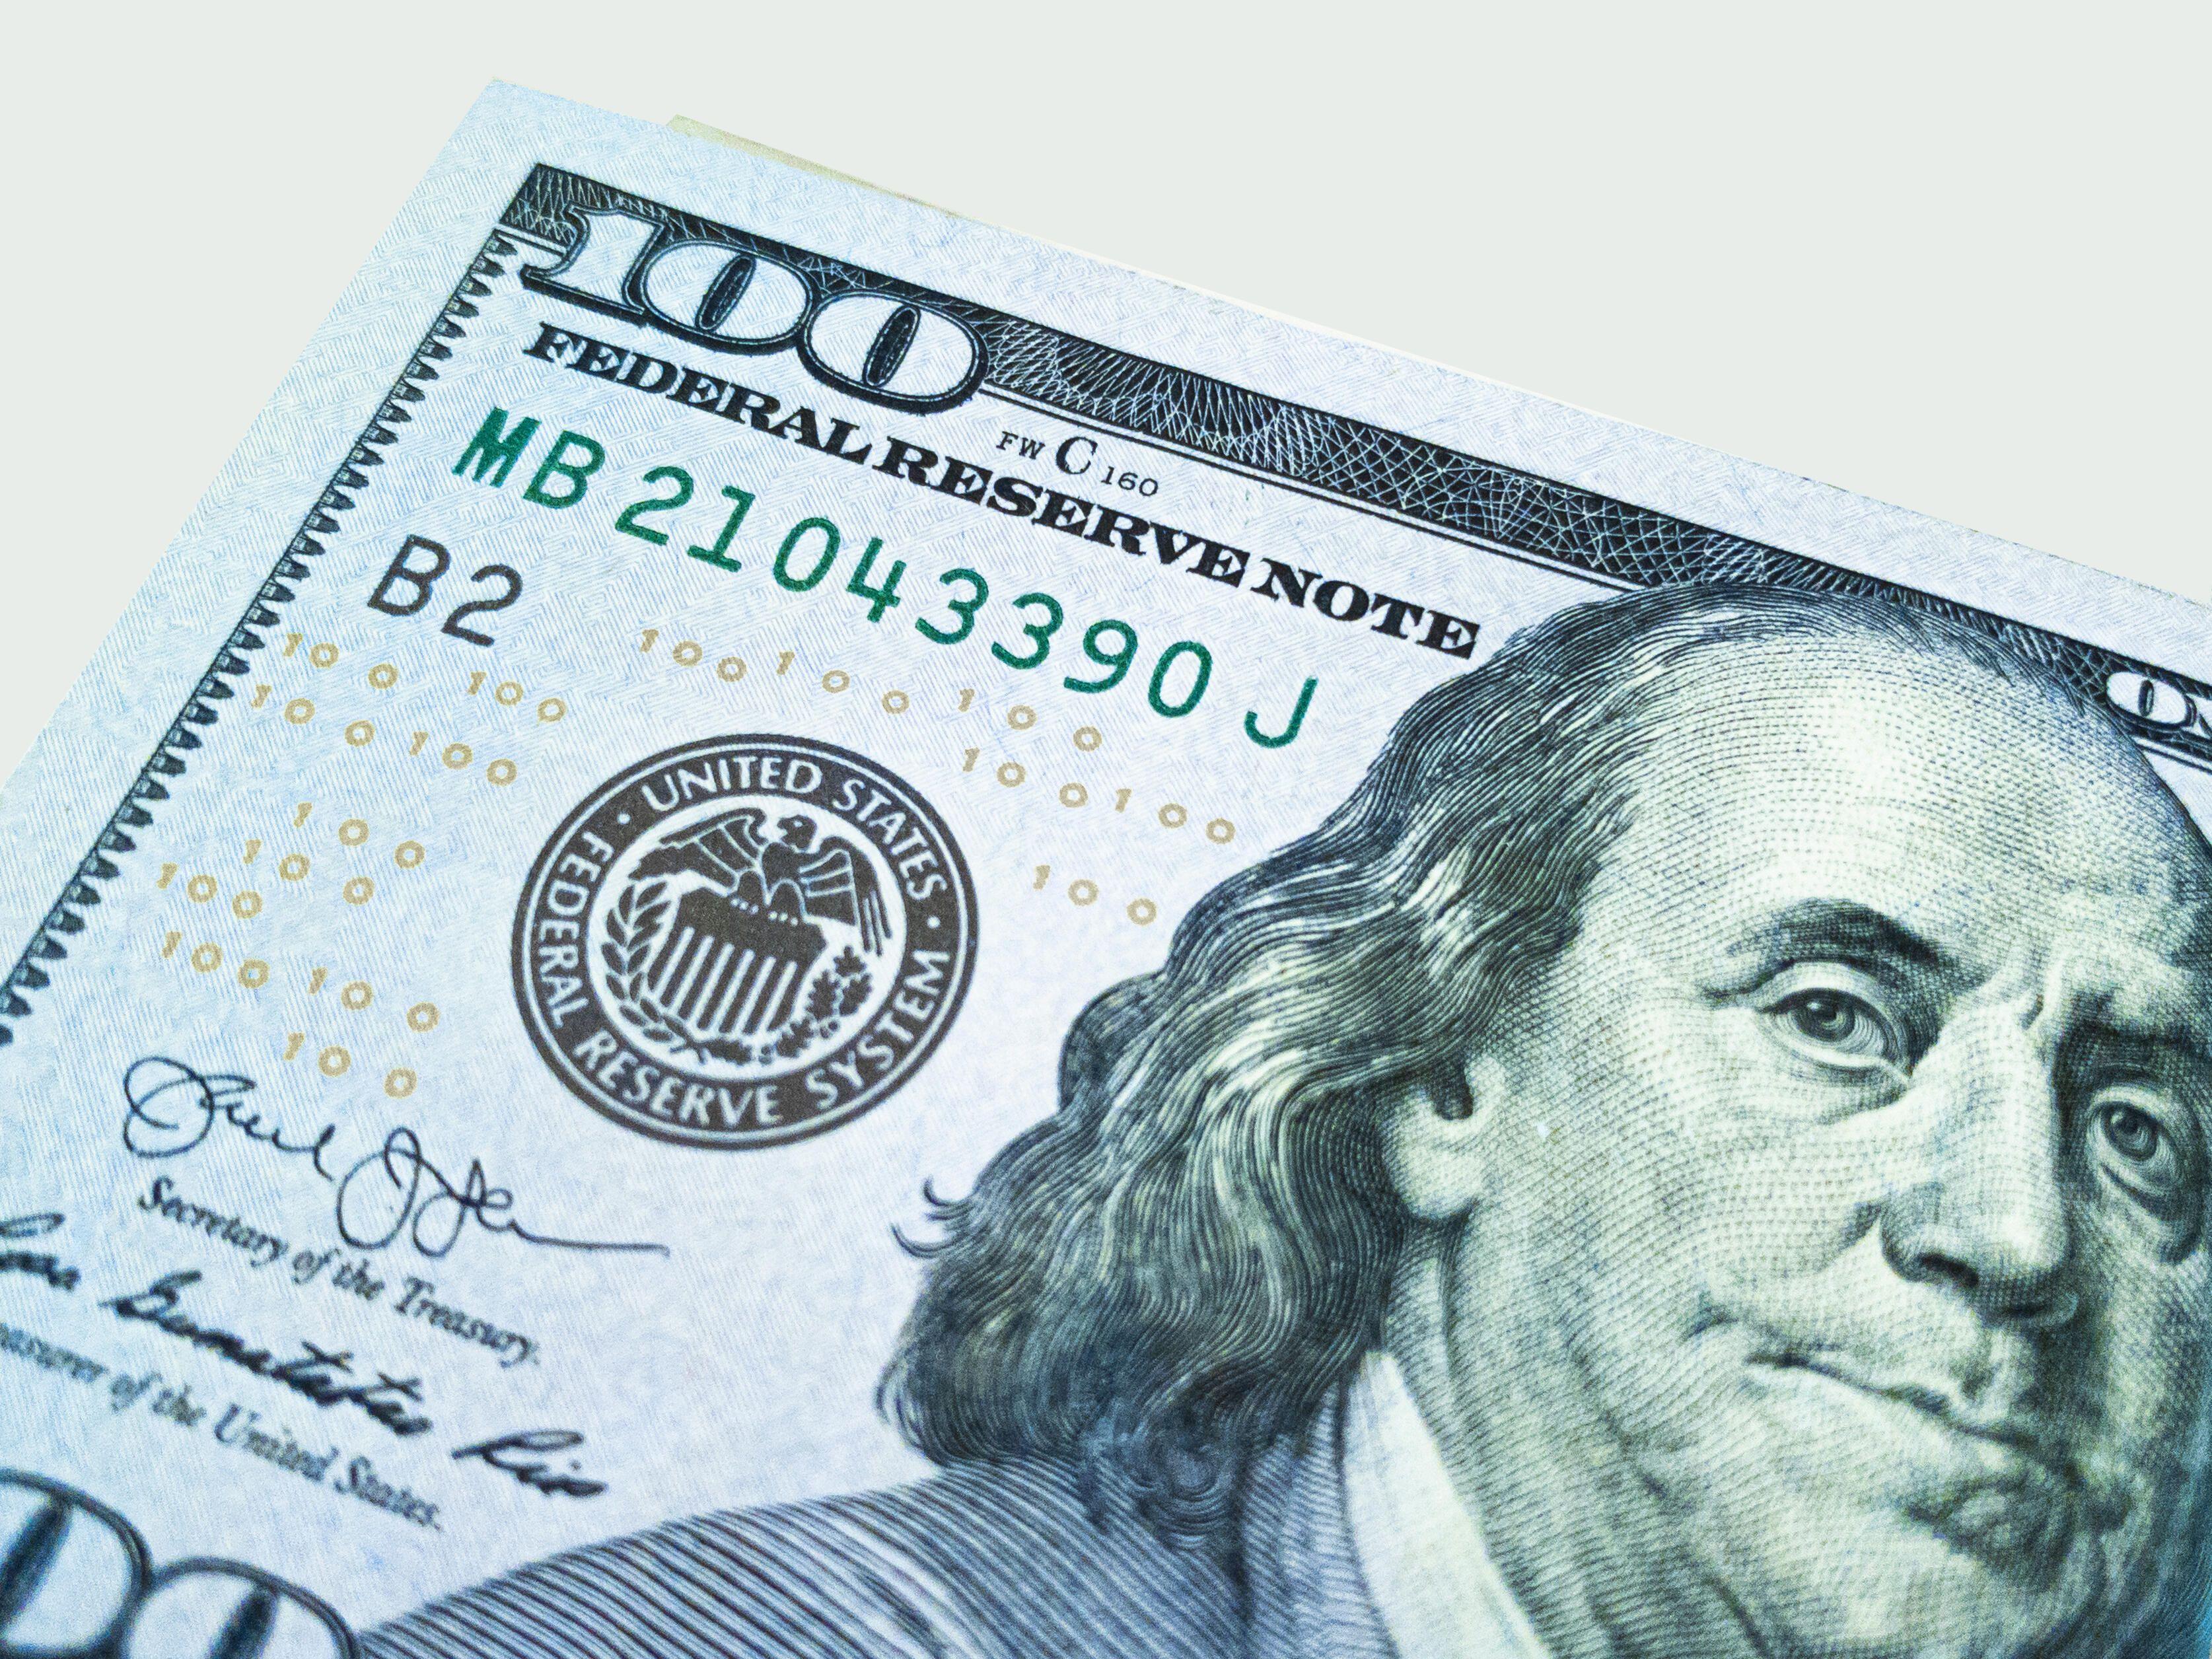 100 dollar bill with Ben Franklin's head